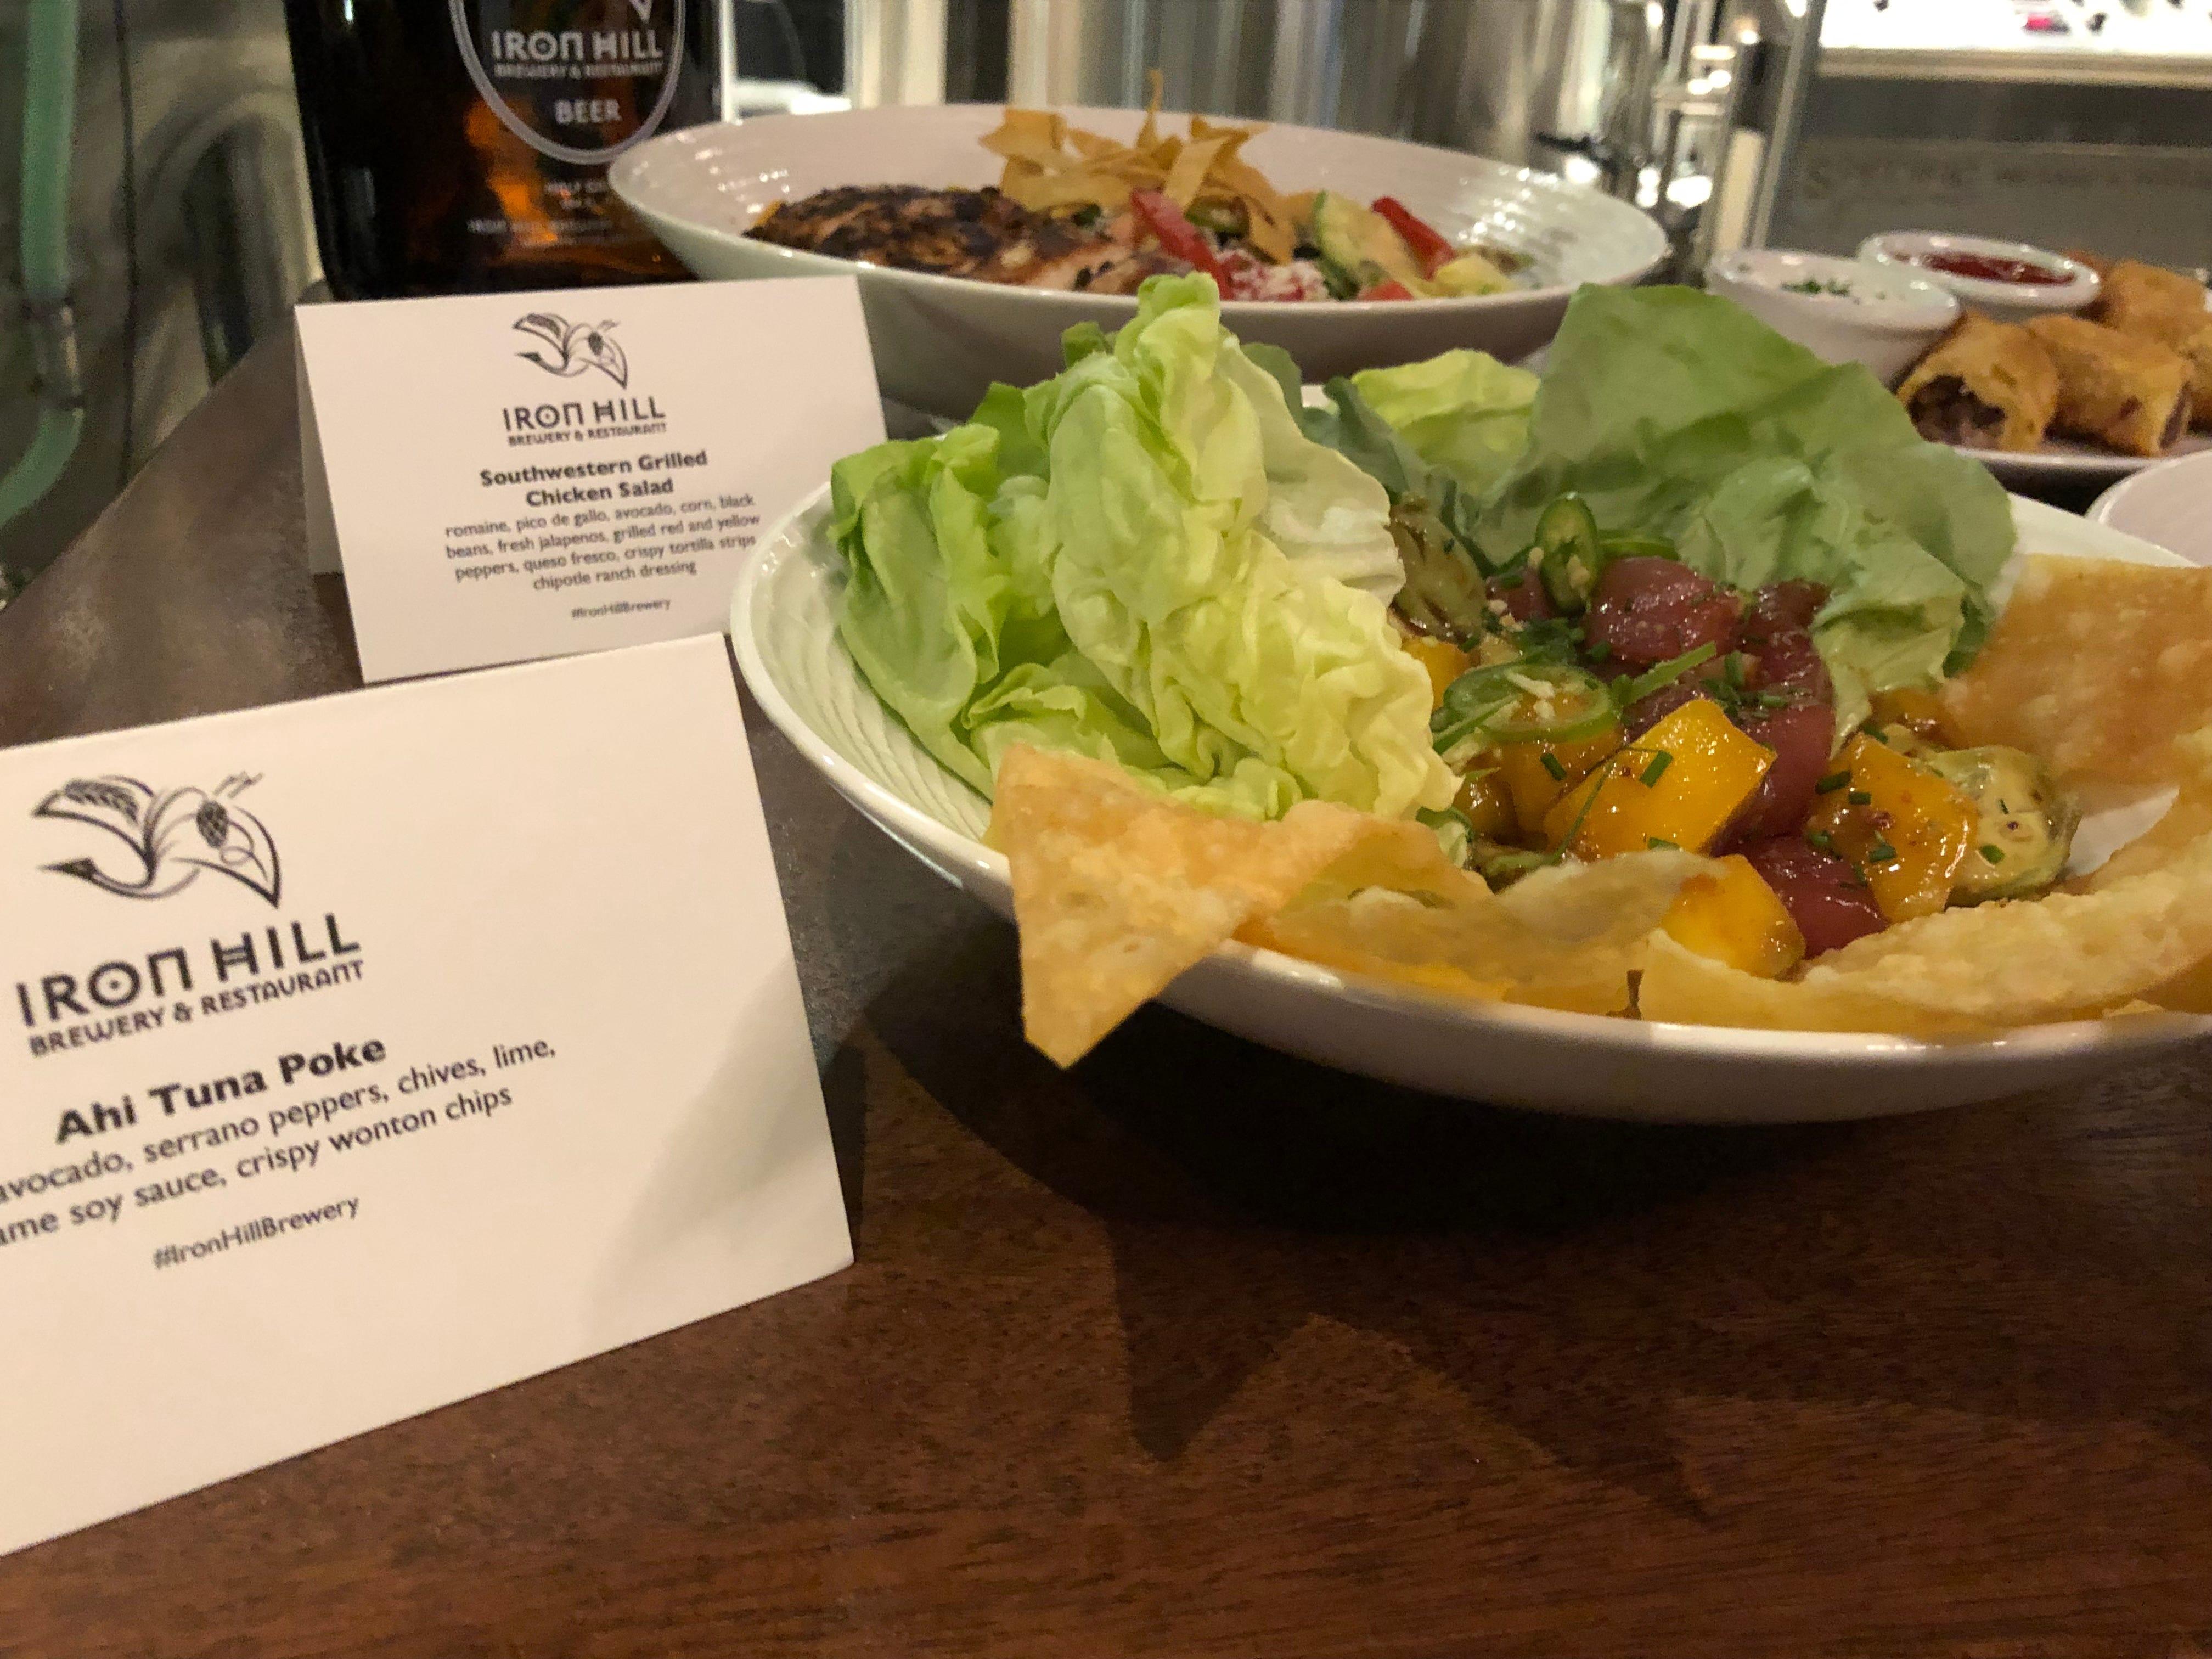 Ahi Tuna Poke at Iron Hill Brewery & Restaurant.